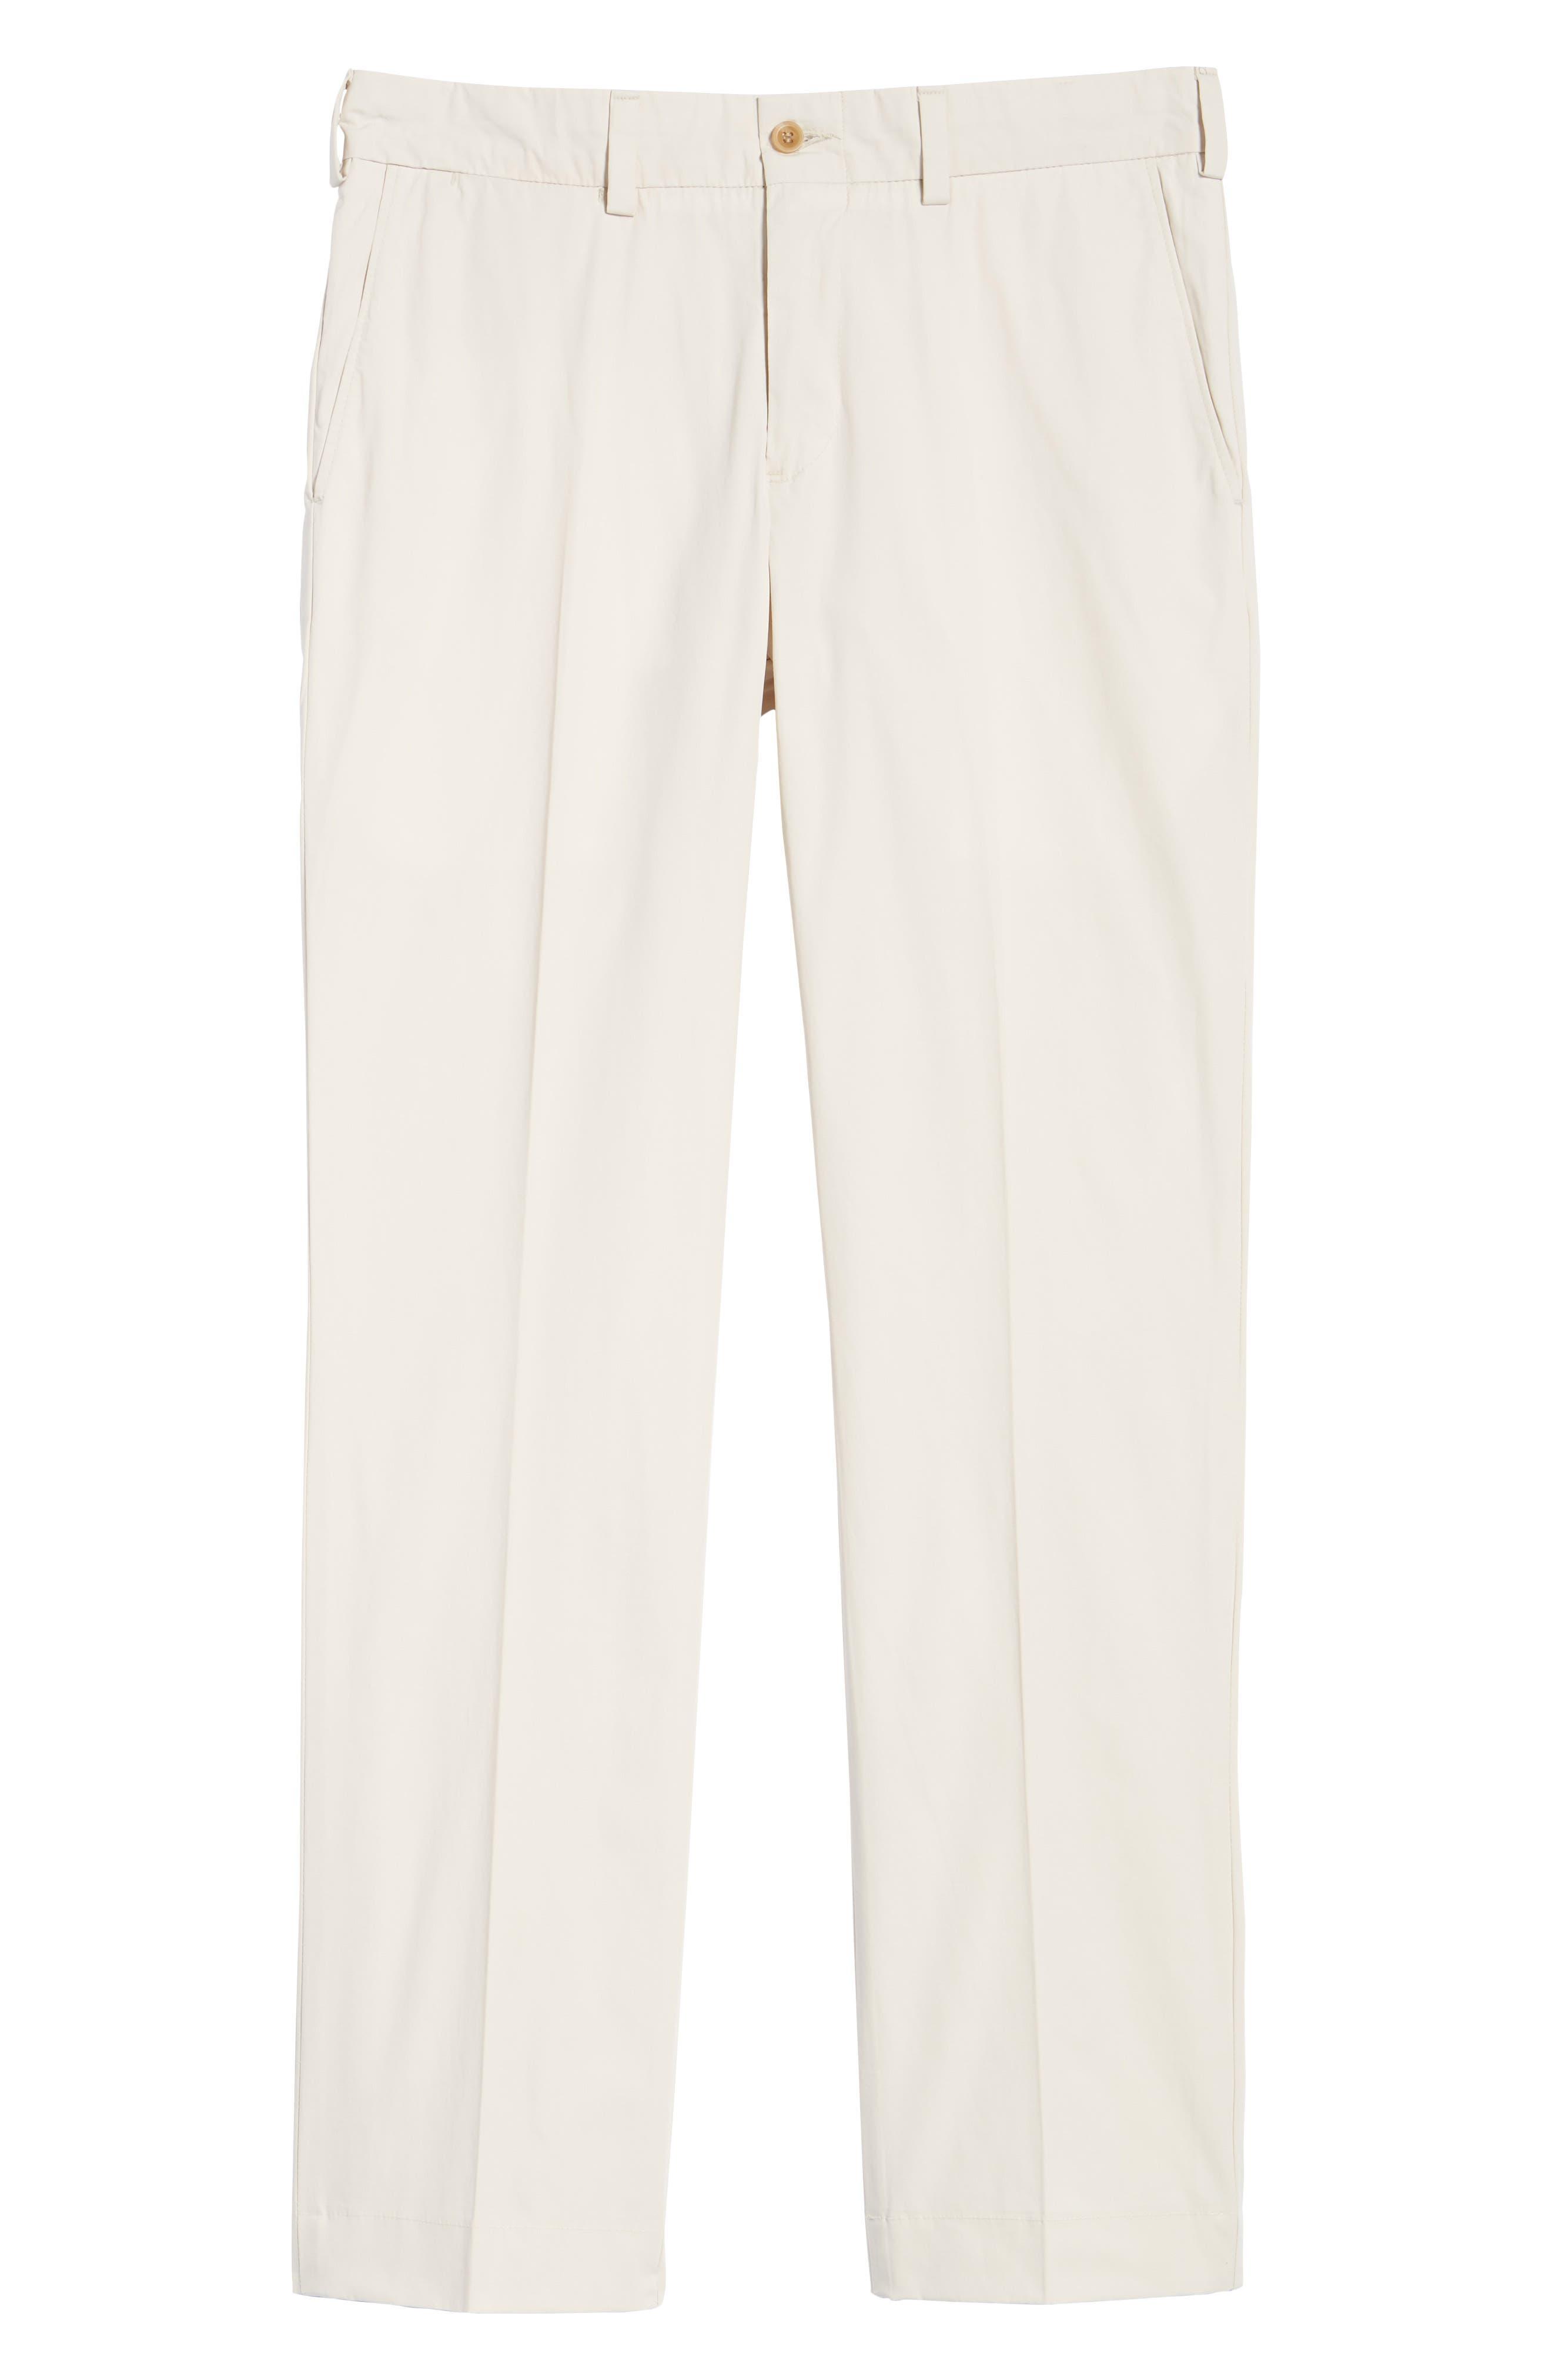 M3 Straight Fit Flat Front Tropical Poplin Pants,                             Alternate thumbnail 6, color,                             Sand